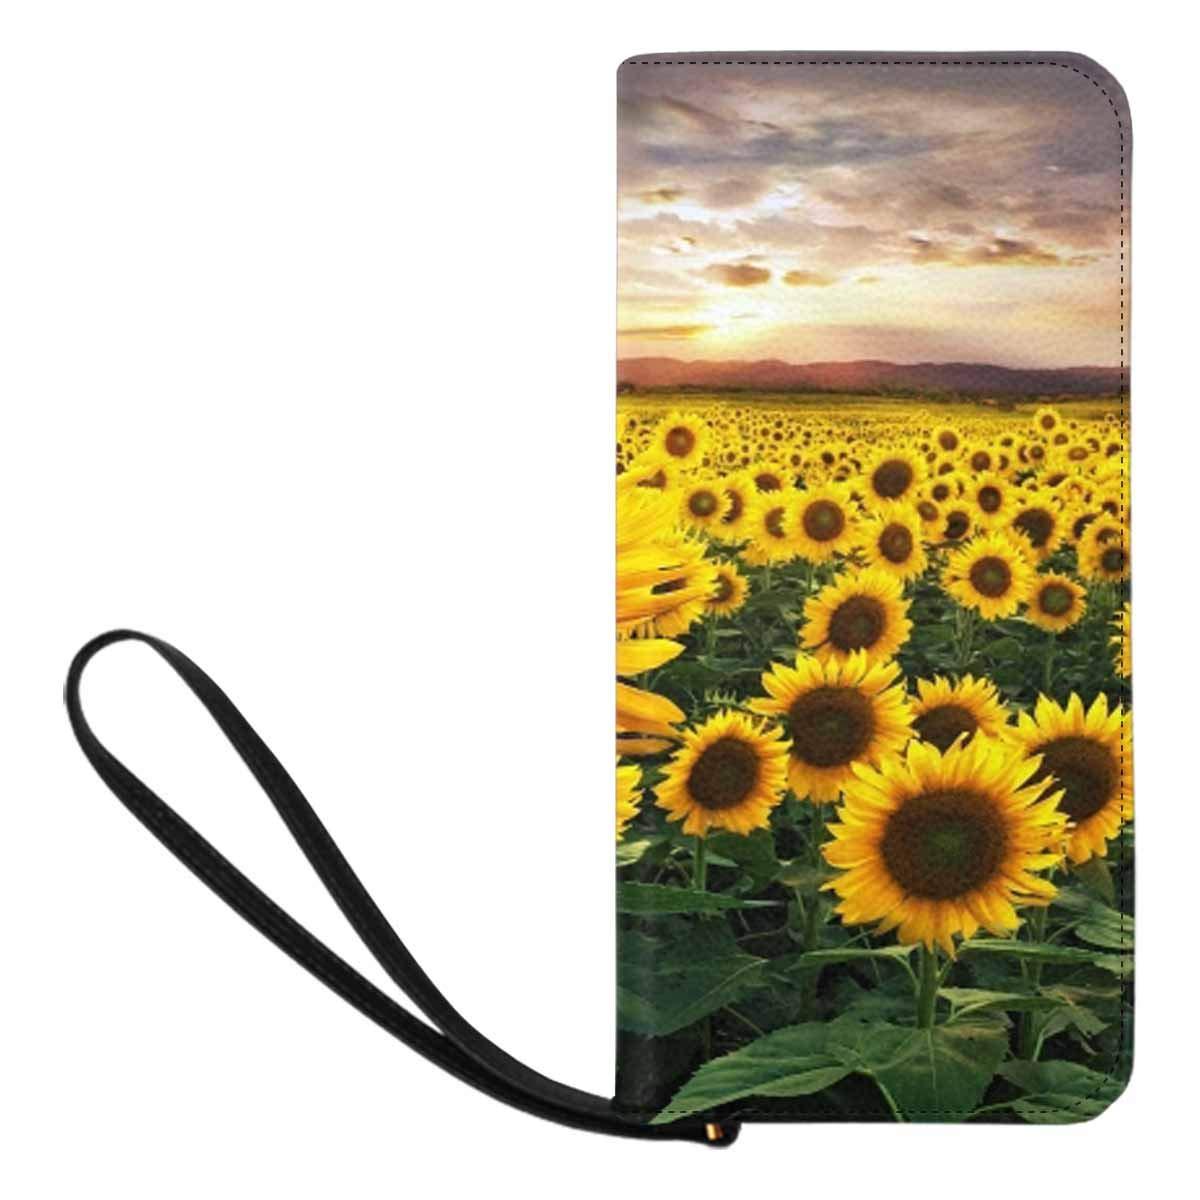 CDM product InterestPrint Sunflowers and Lavender Flowers Womens Clutch Wallet Large Wristlet Zipper Clutch Large Travel Purse big image